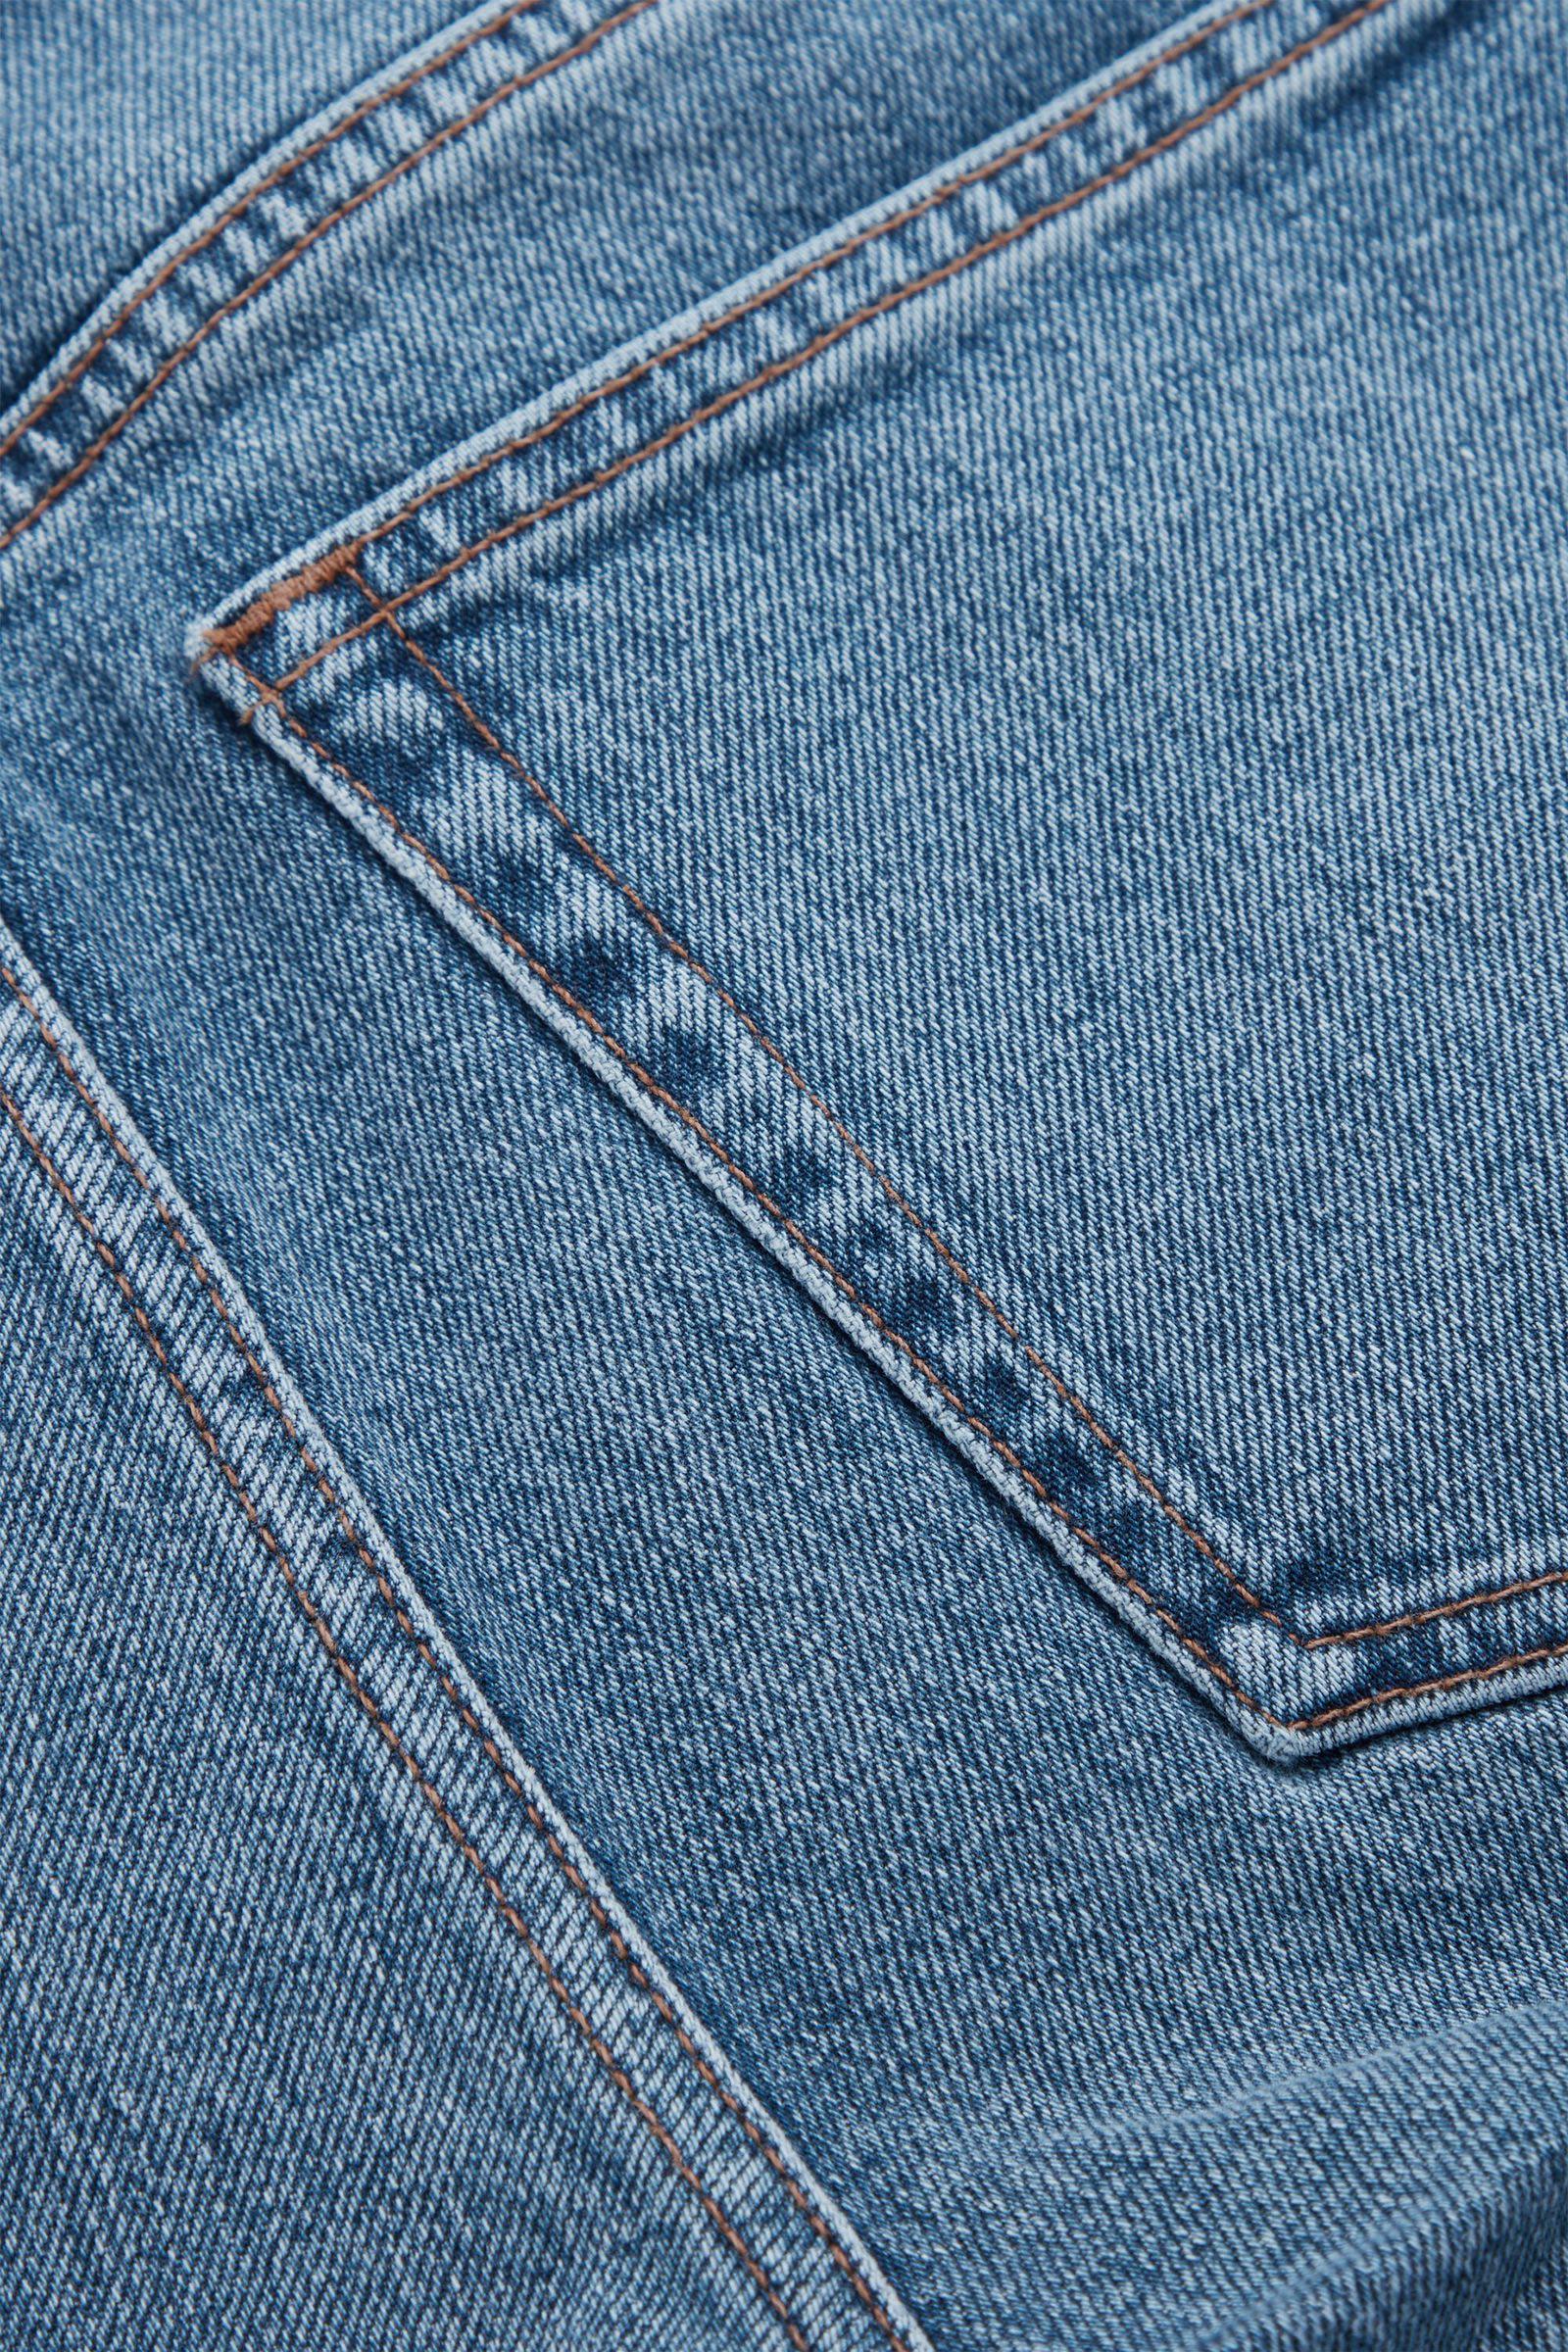 COS 오가닉 코튼 슬림 레그 진의 라이트 블루컬러 Detail입니다.